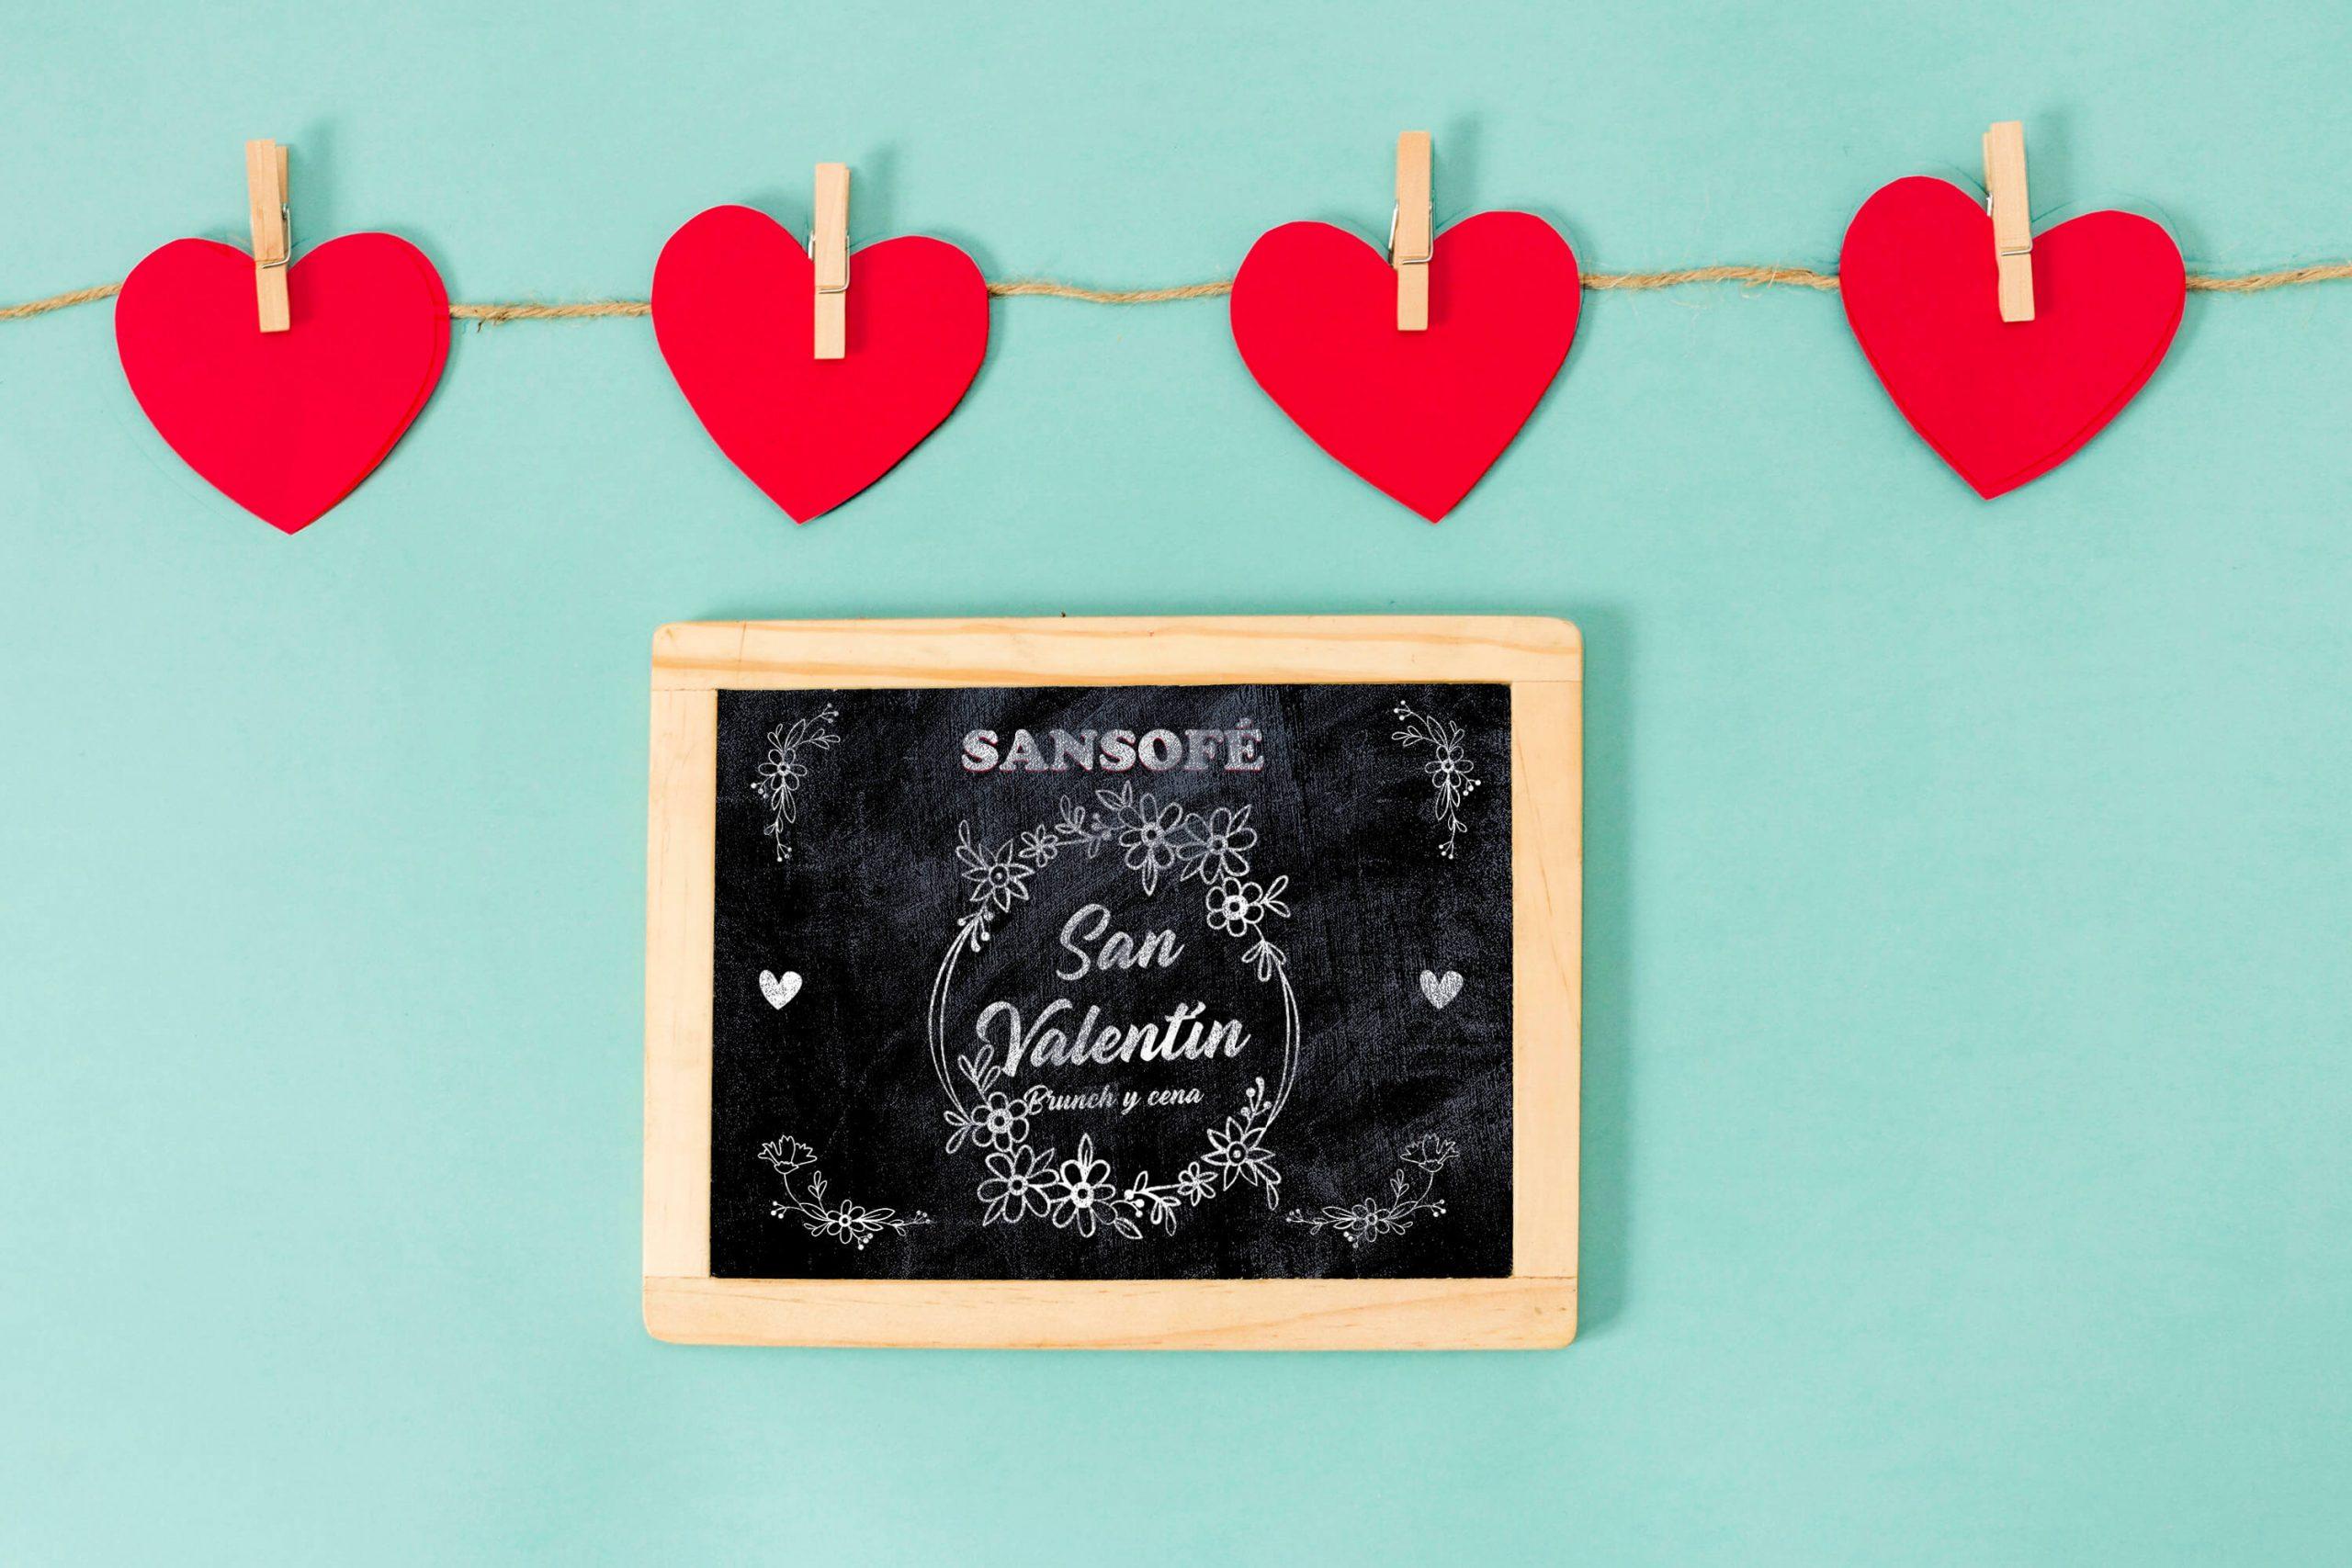 Tasca Sansofé brunch y cena de San Valentín